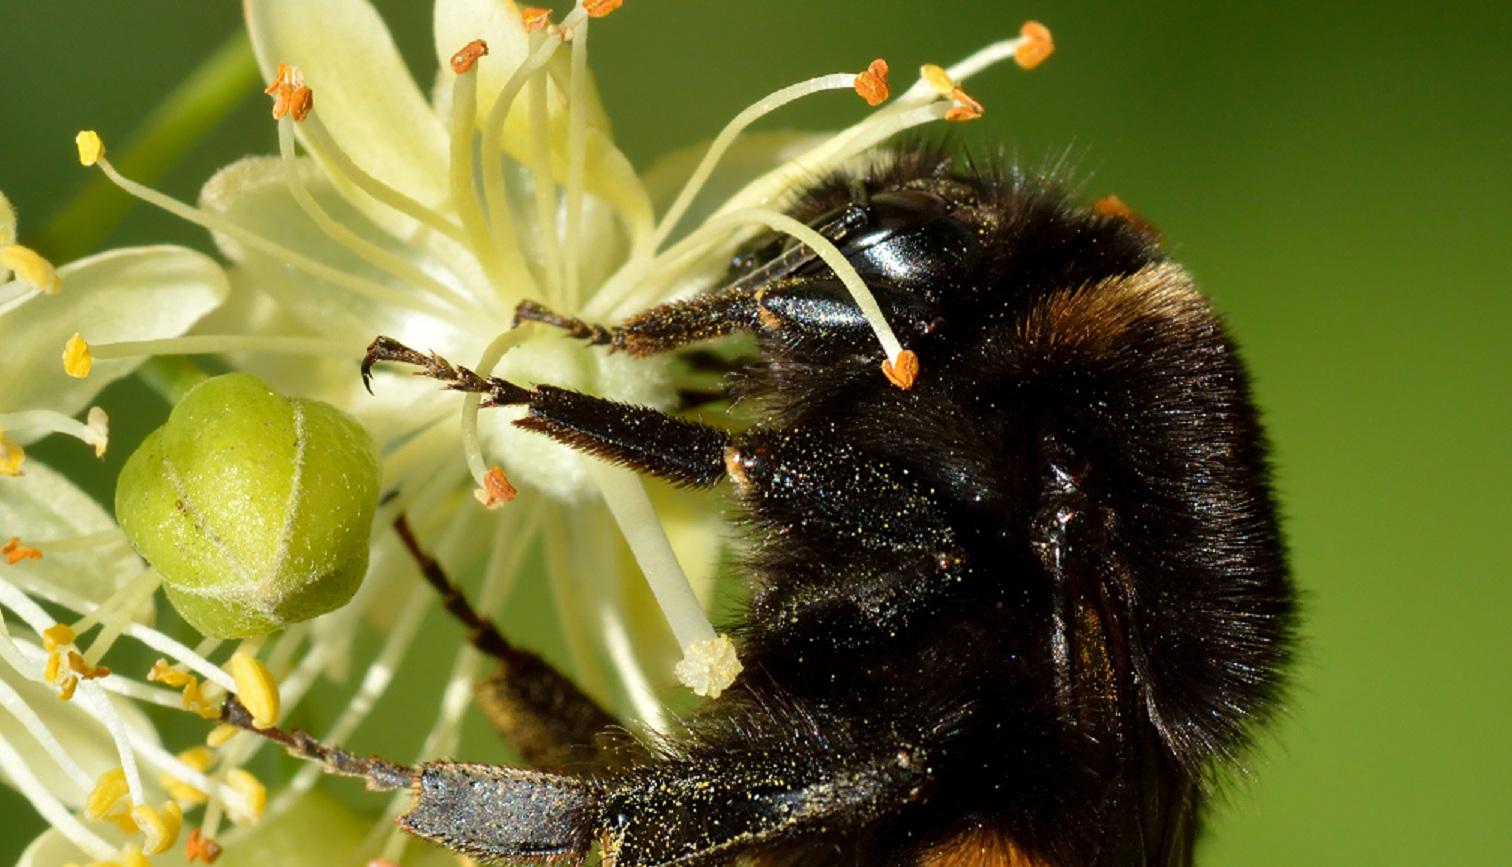 El abejorro común (Bombus terrestris). Imagen:  Ivar Leidus - Trabajo propio. CC BY-SA 4.0. Fuente: Wikimedia Commons.